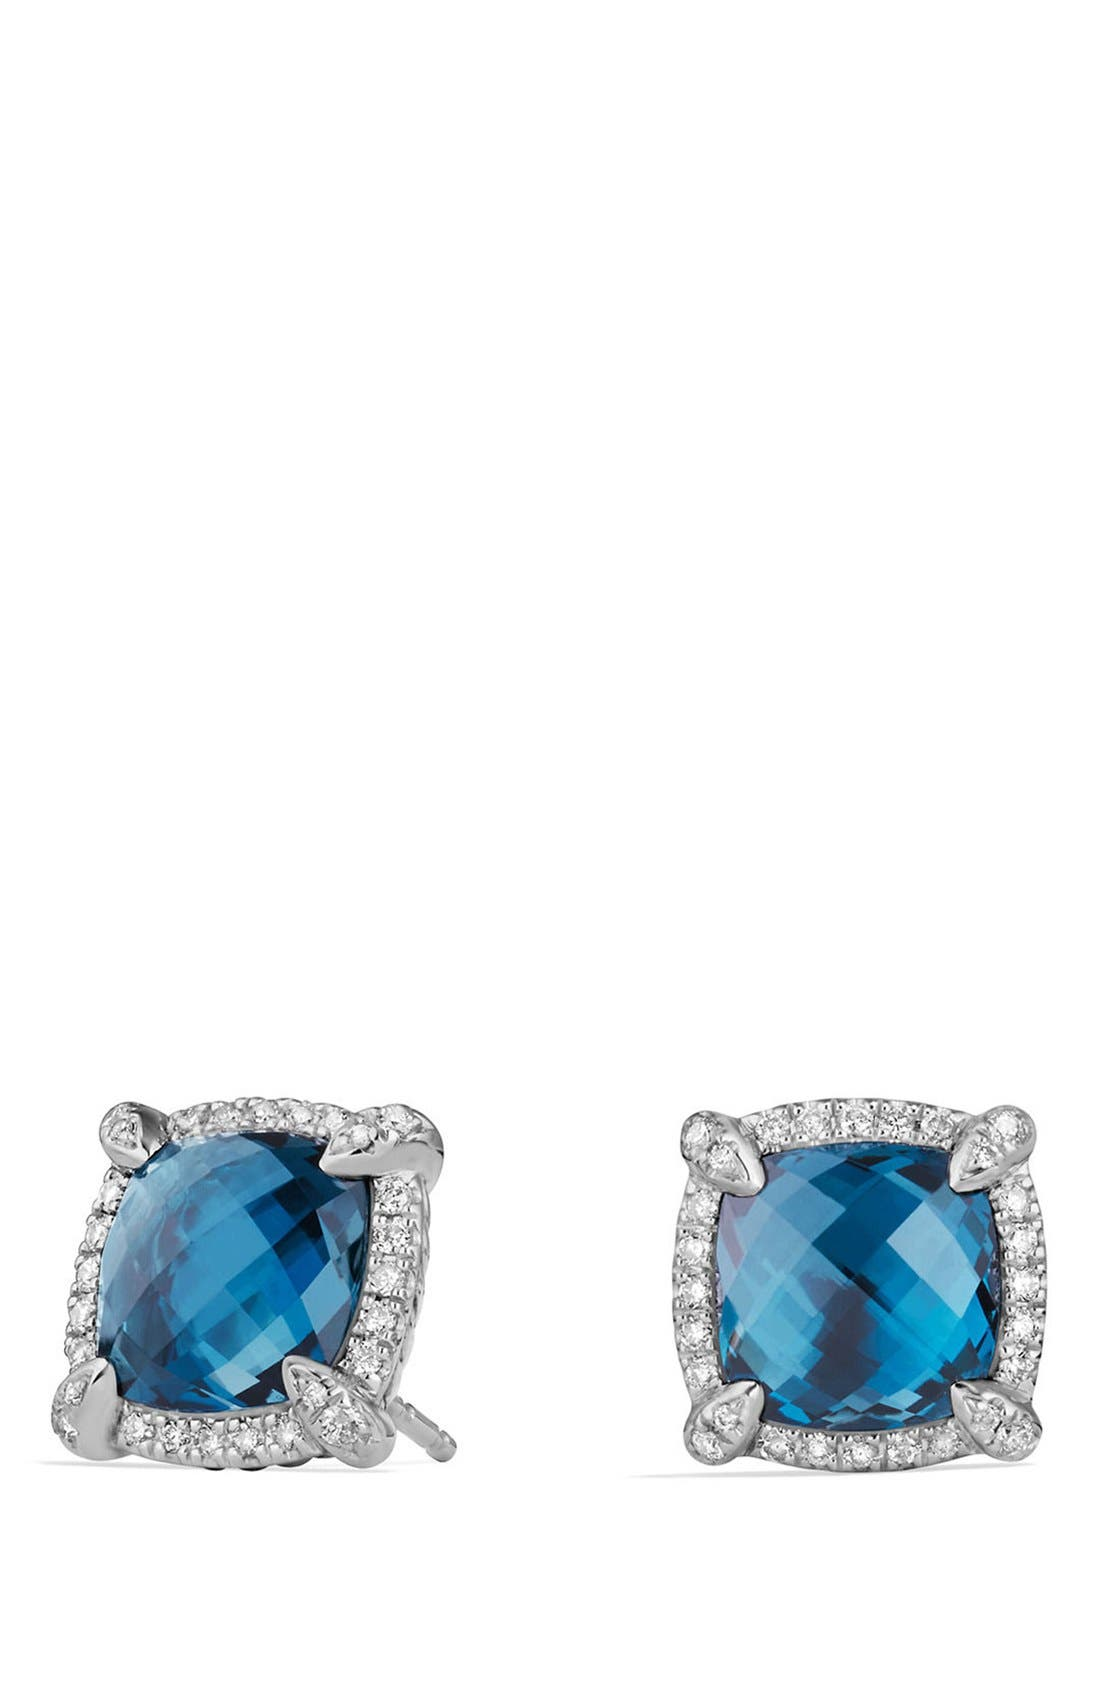 'Châtelaine' Pavé Bezel Stud Earrings with Diamonds,                         Main,                         color, Blue Topaz